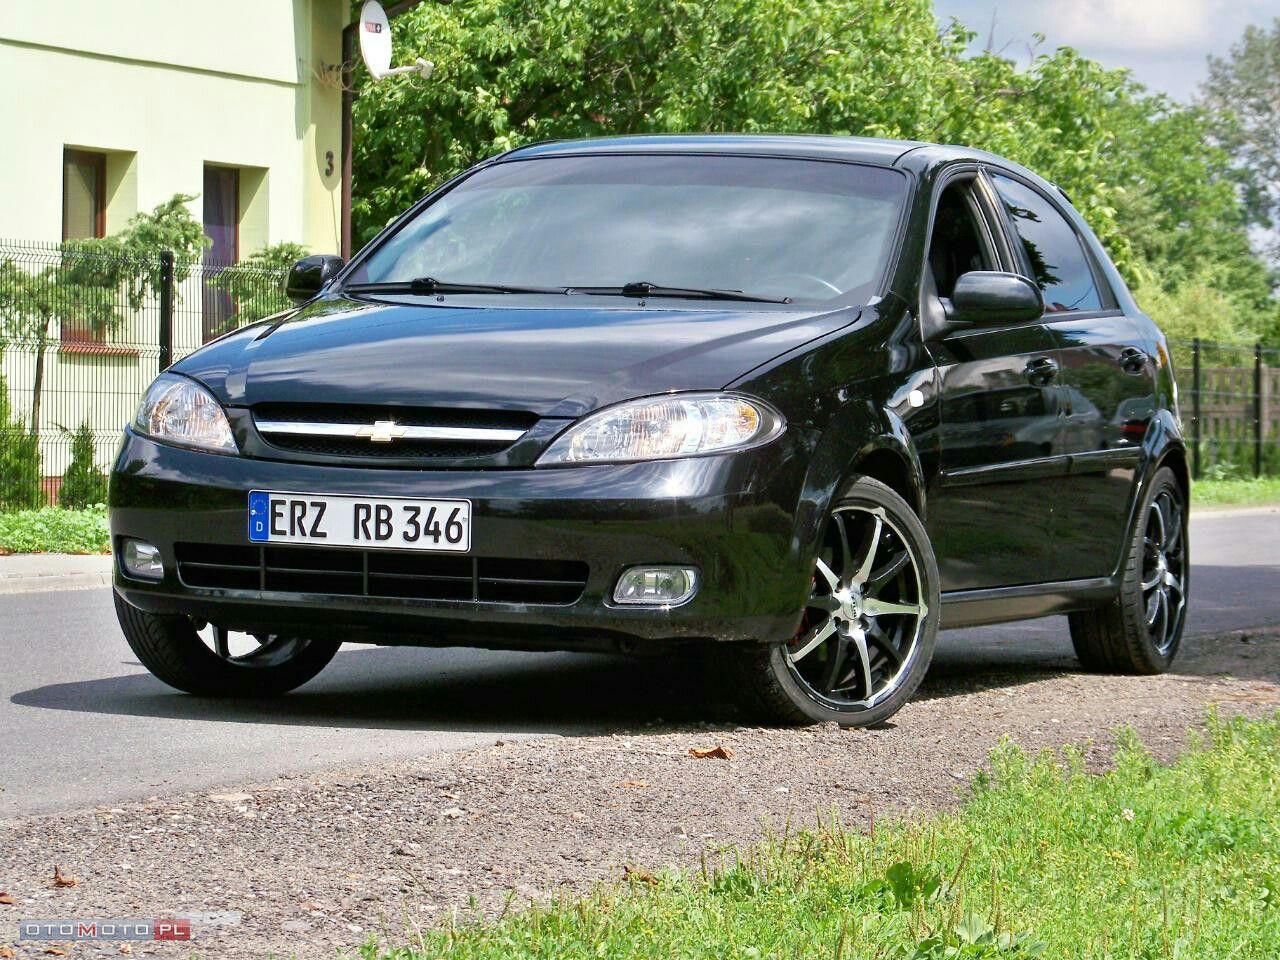 Chevrolet Lacetti Chevrolet Bmw Suv Car